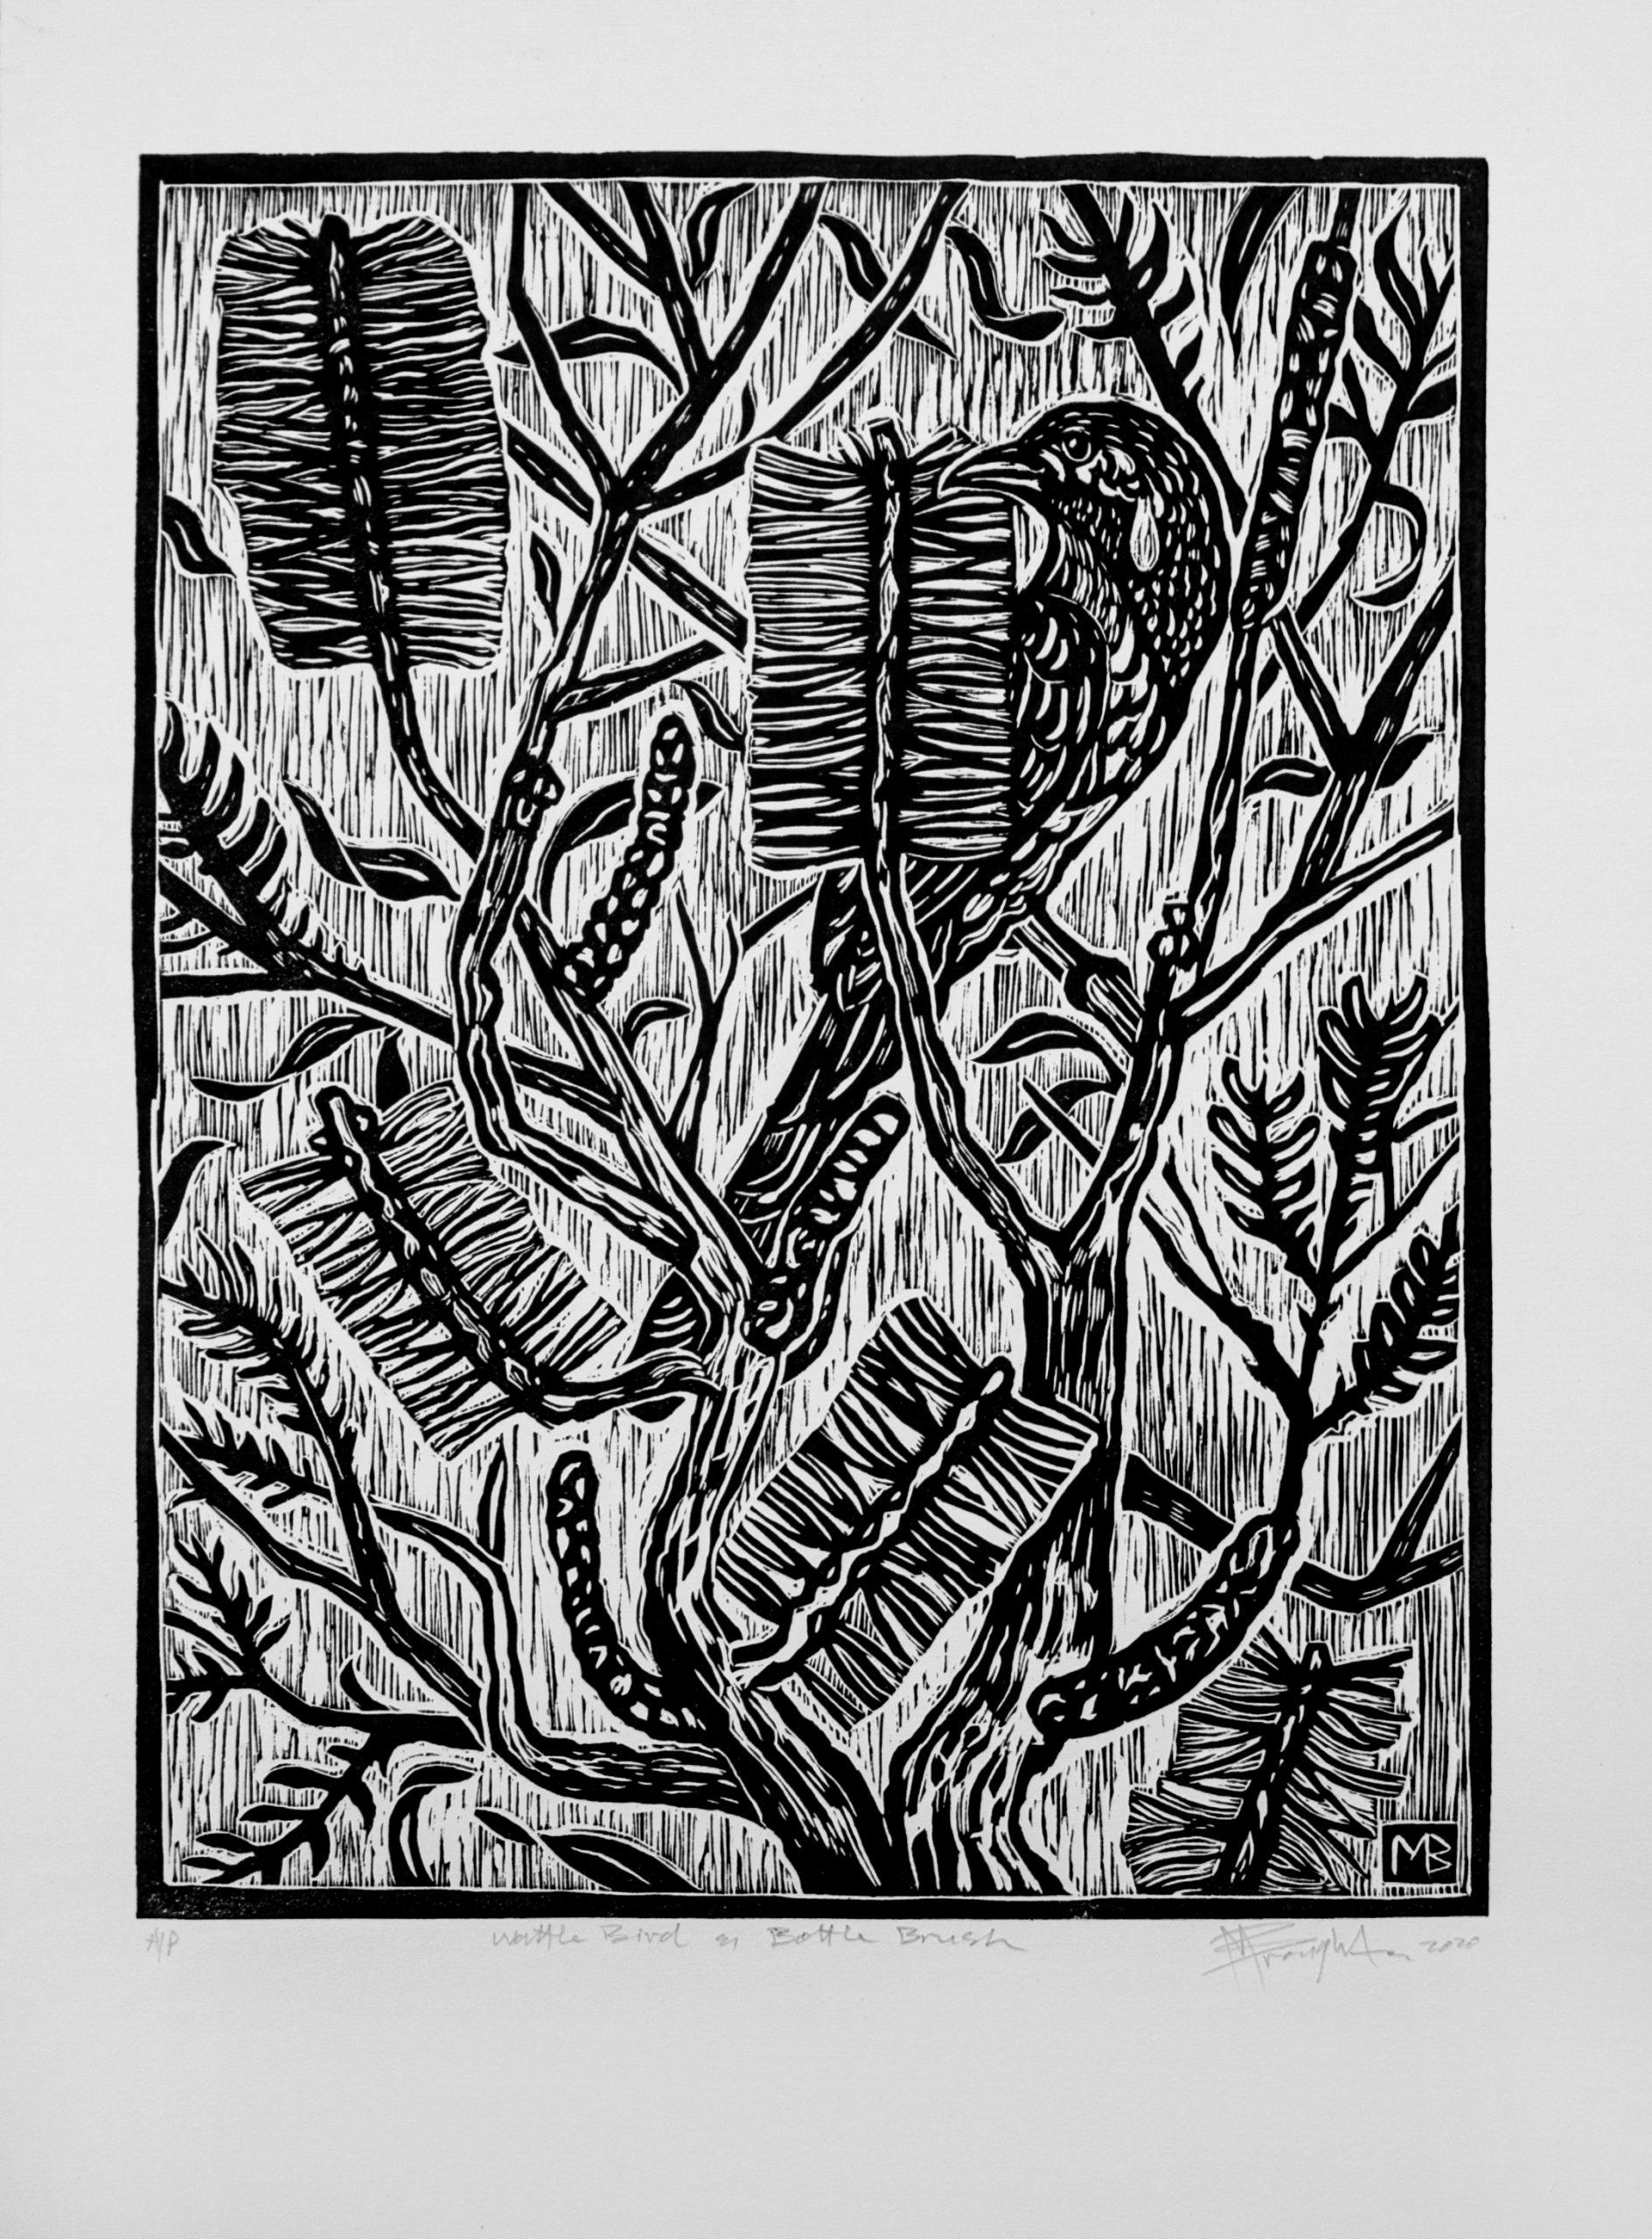 Wattle Bird And Bottle Brush Linocut 2 Copy